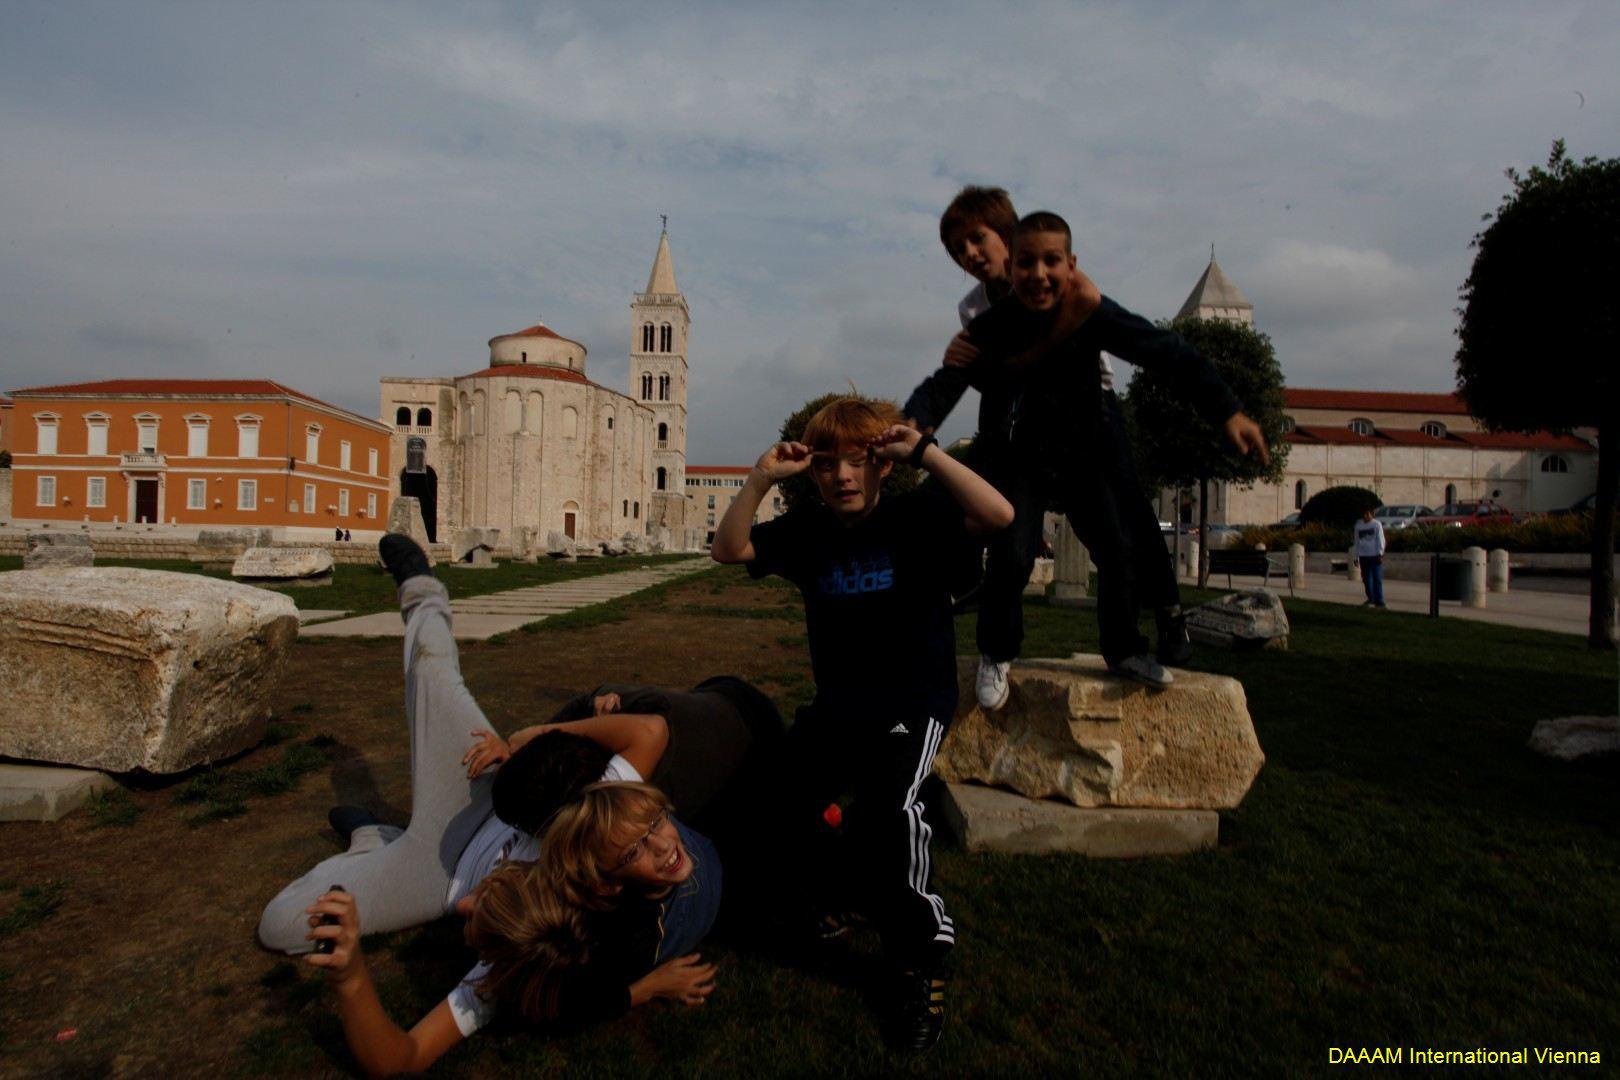 DAAAM_2012_Zadar_00_Zadar_City_035